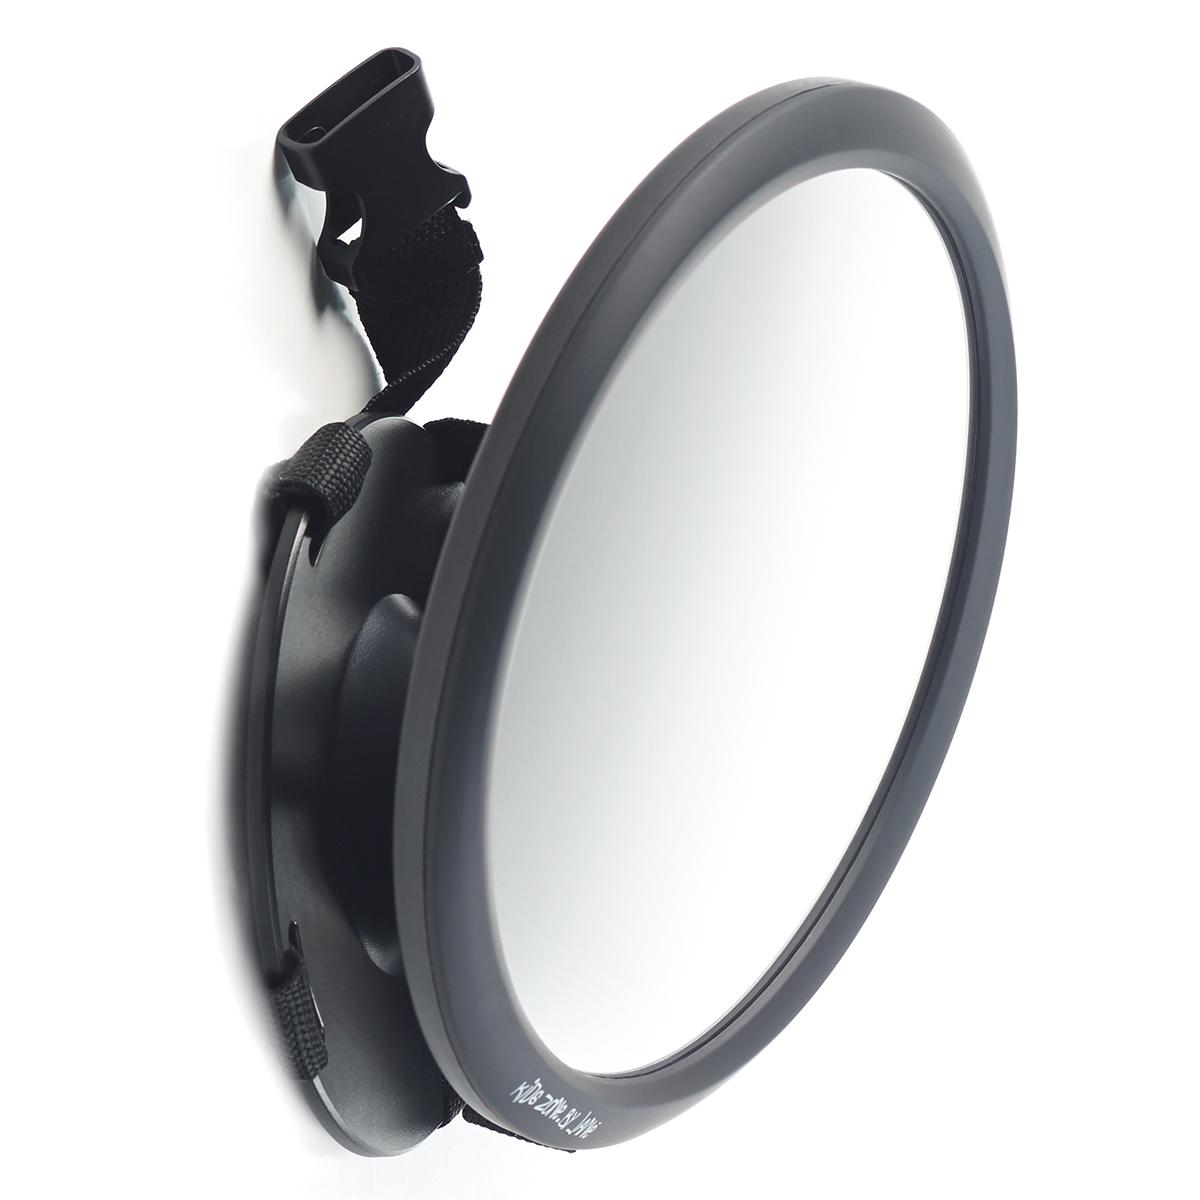 Sécurité Miroir de Sécurité Miroir de Sécurité